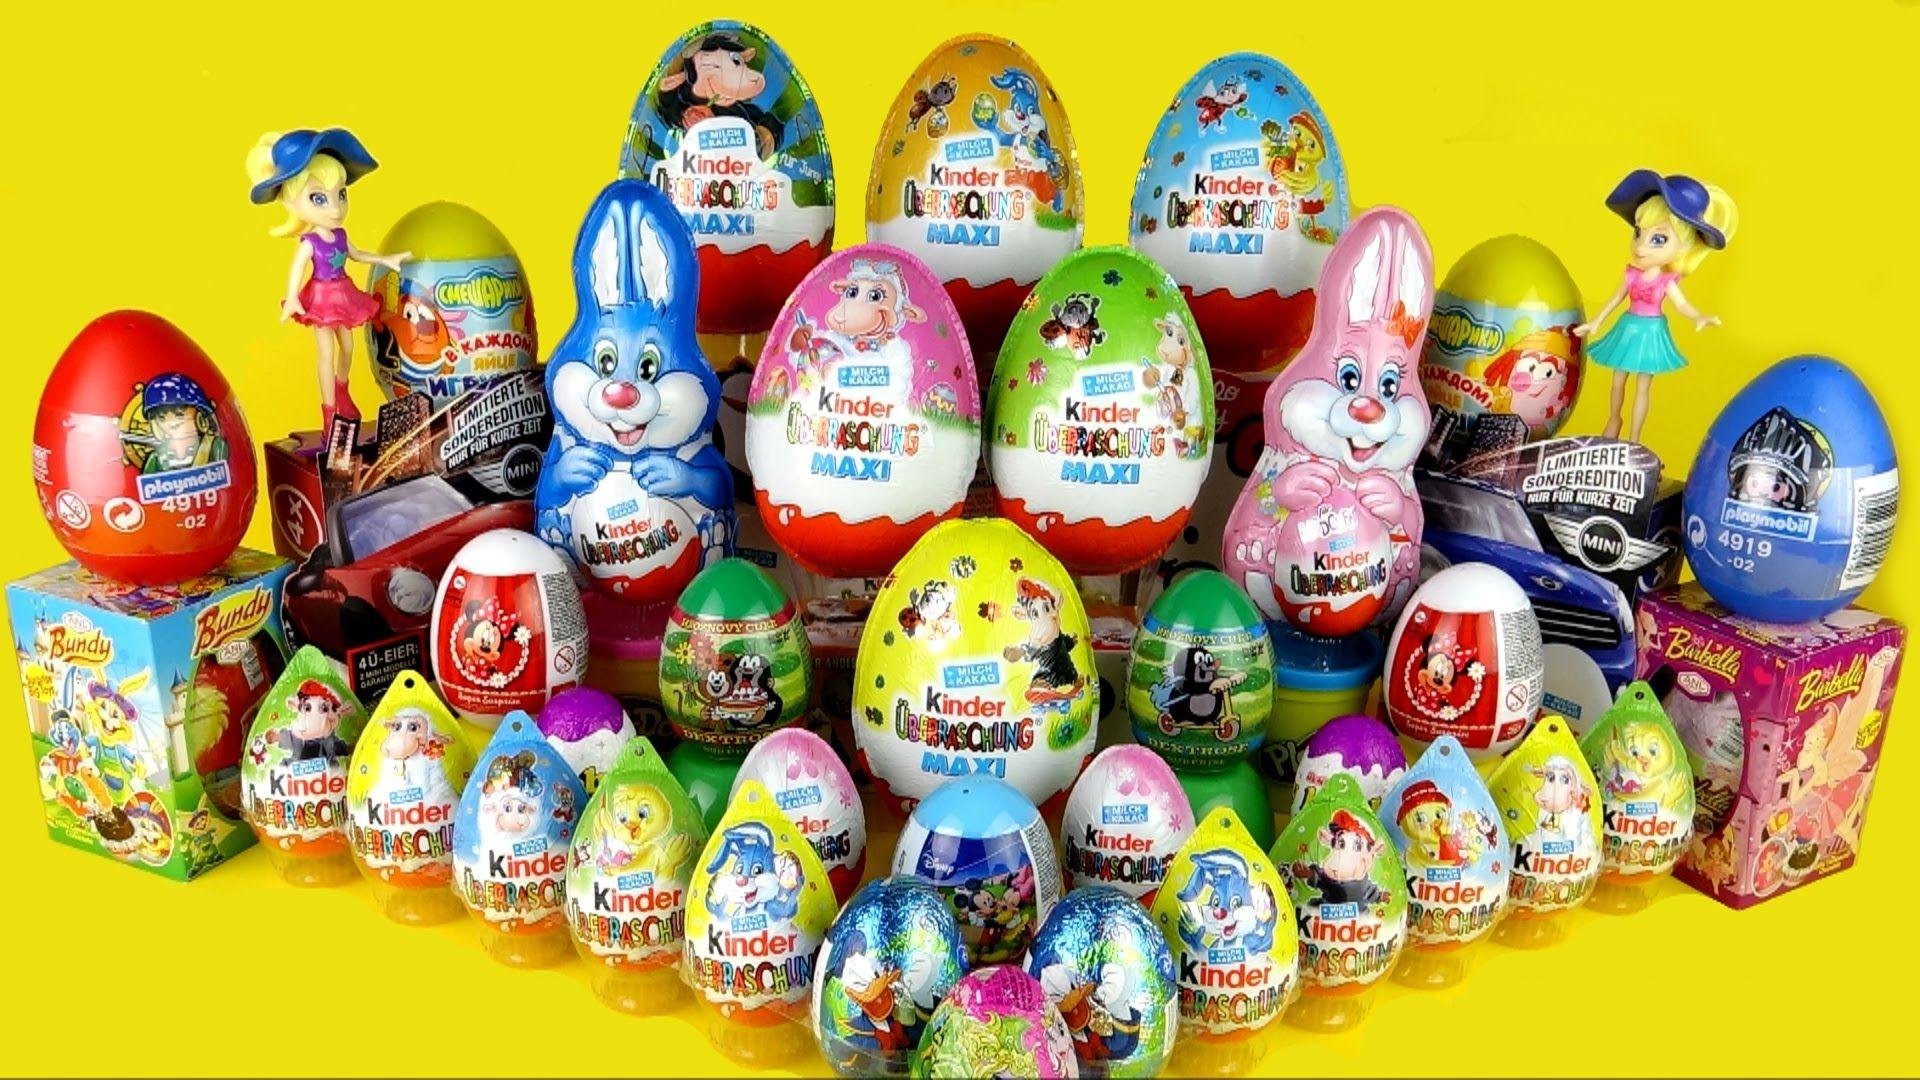 095b01e32 30 Surprise Eggs Cars 2 Spongebob Disney Pixar Maxi Minions, My Little Pony